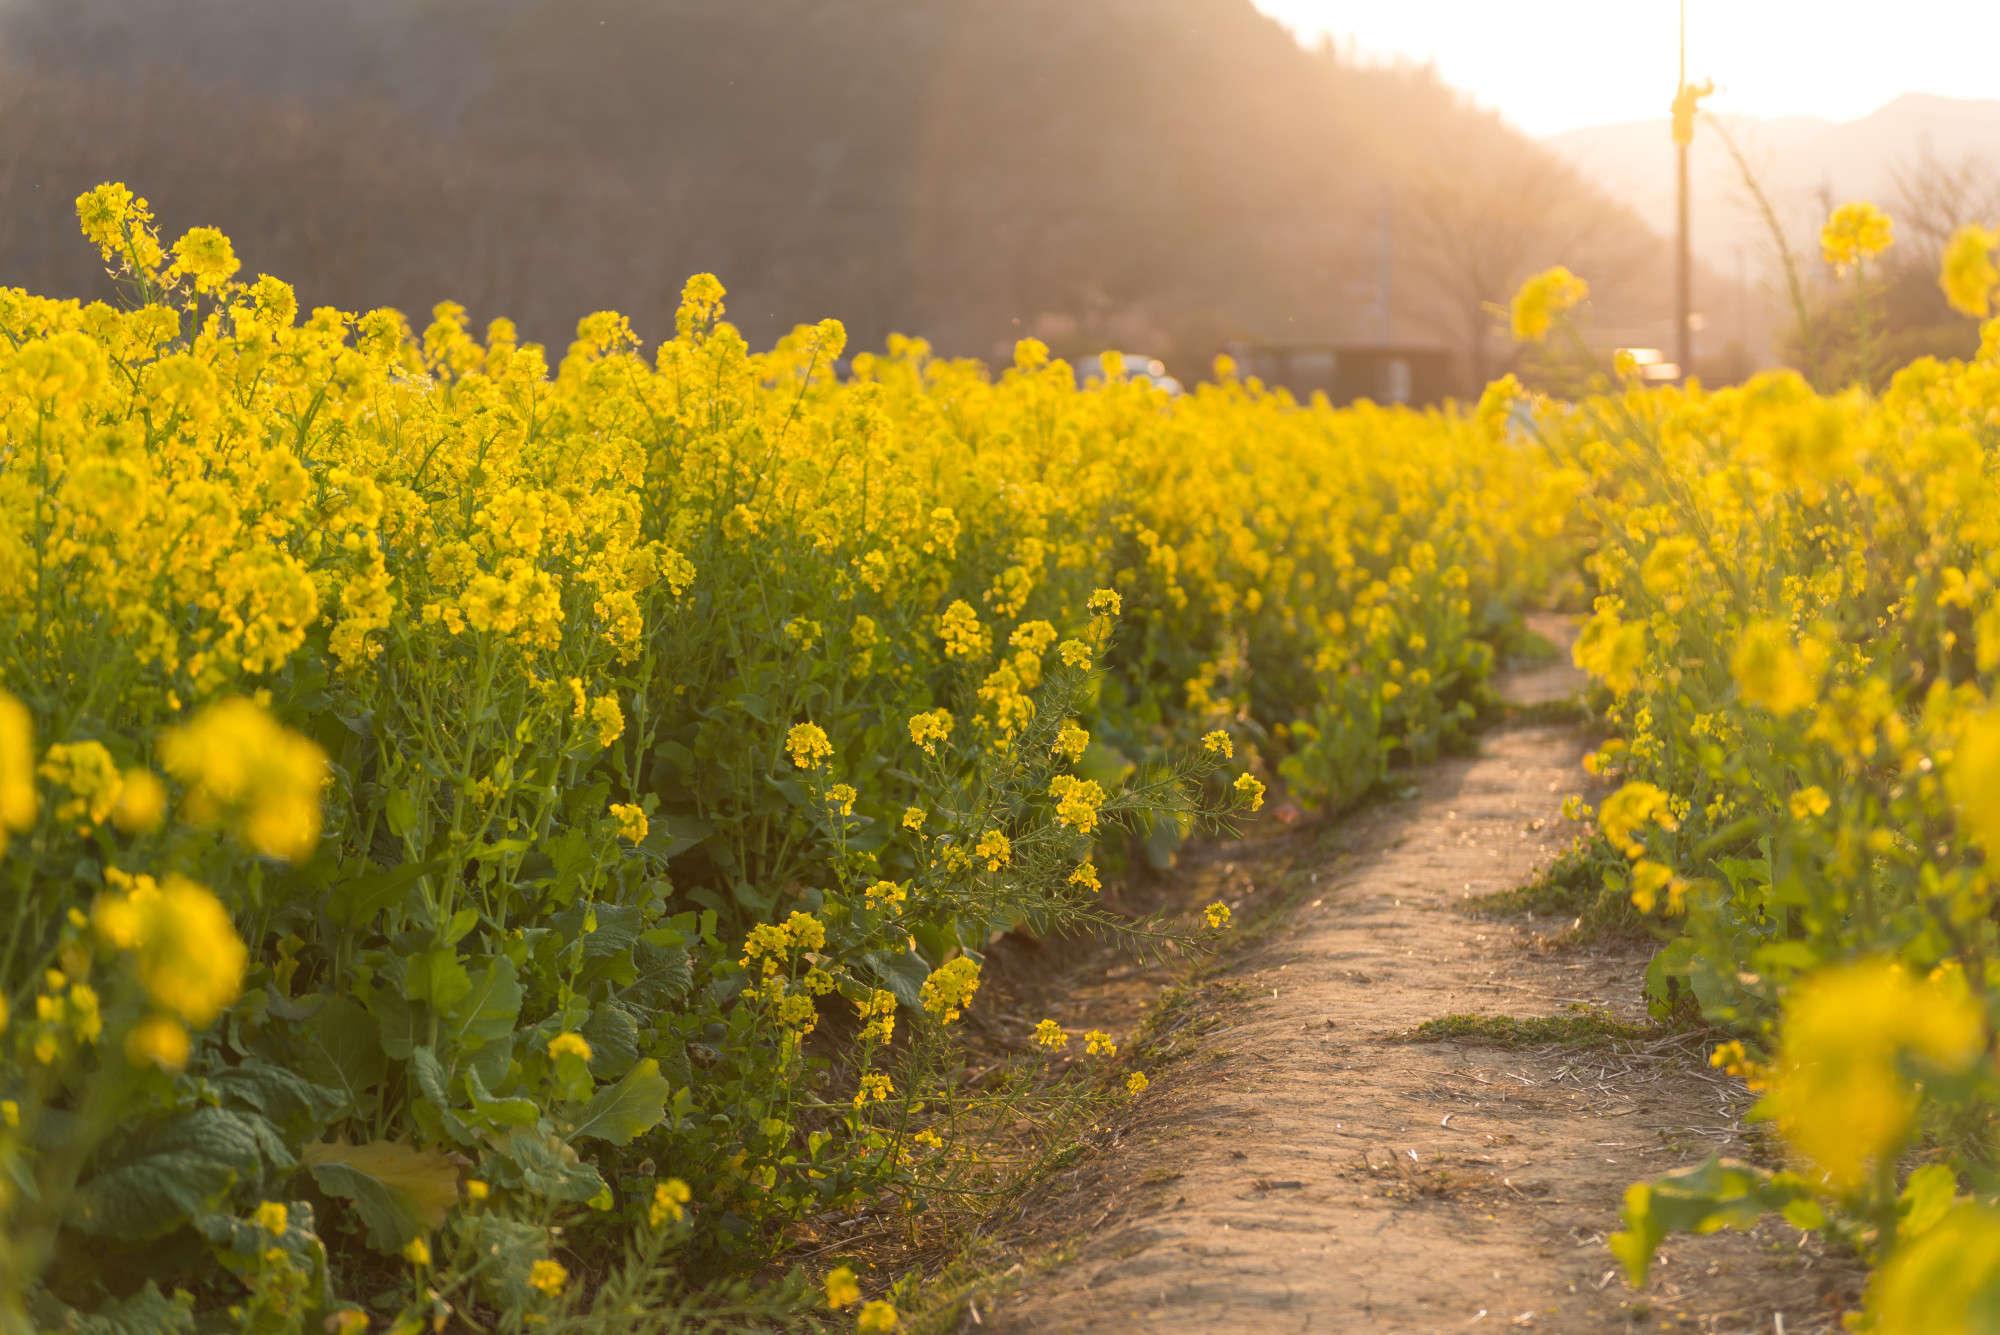 mustard plant - Ideal.vistalist.co